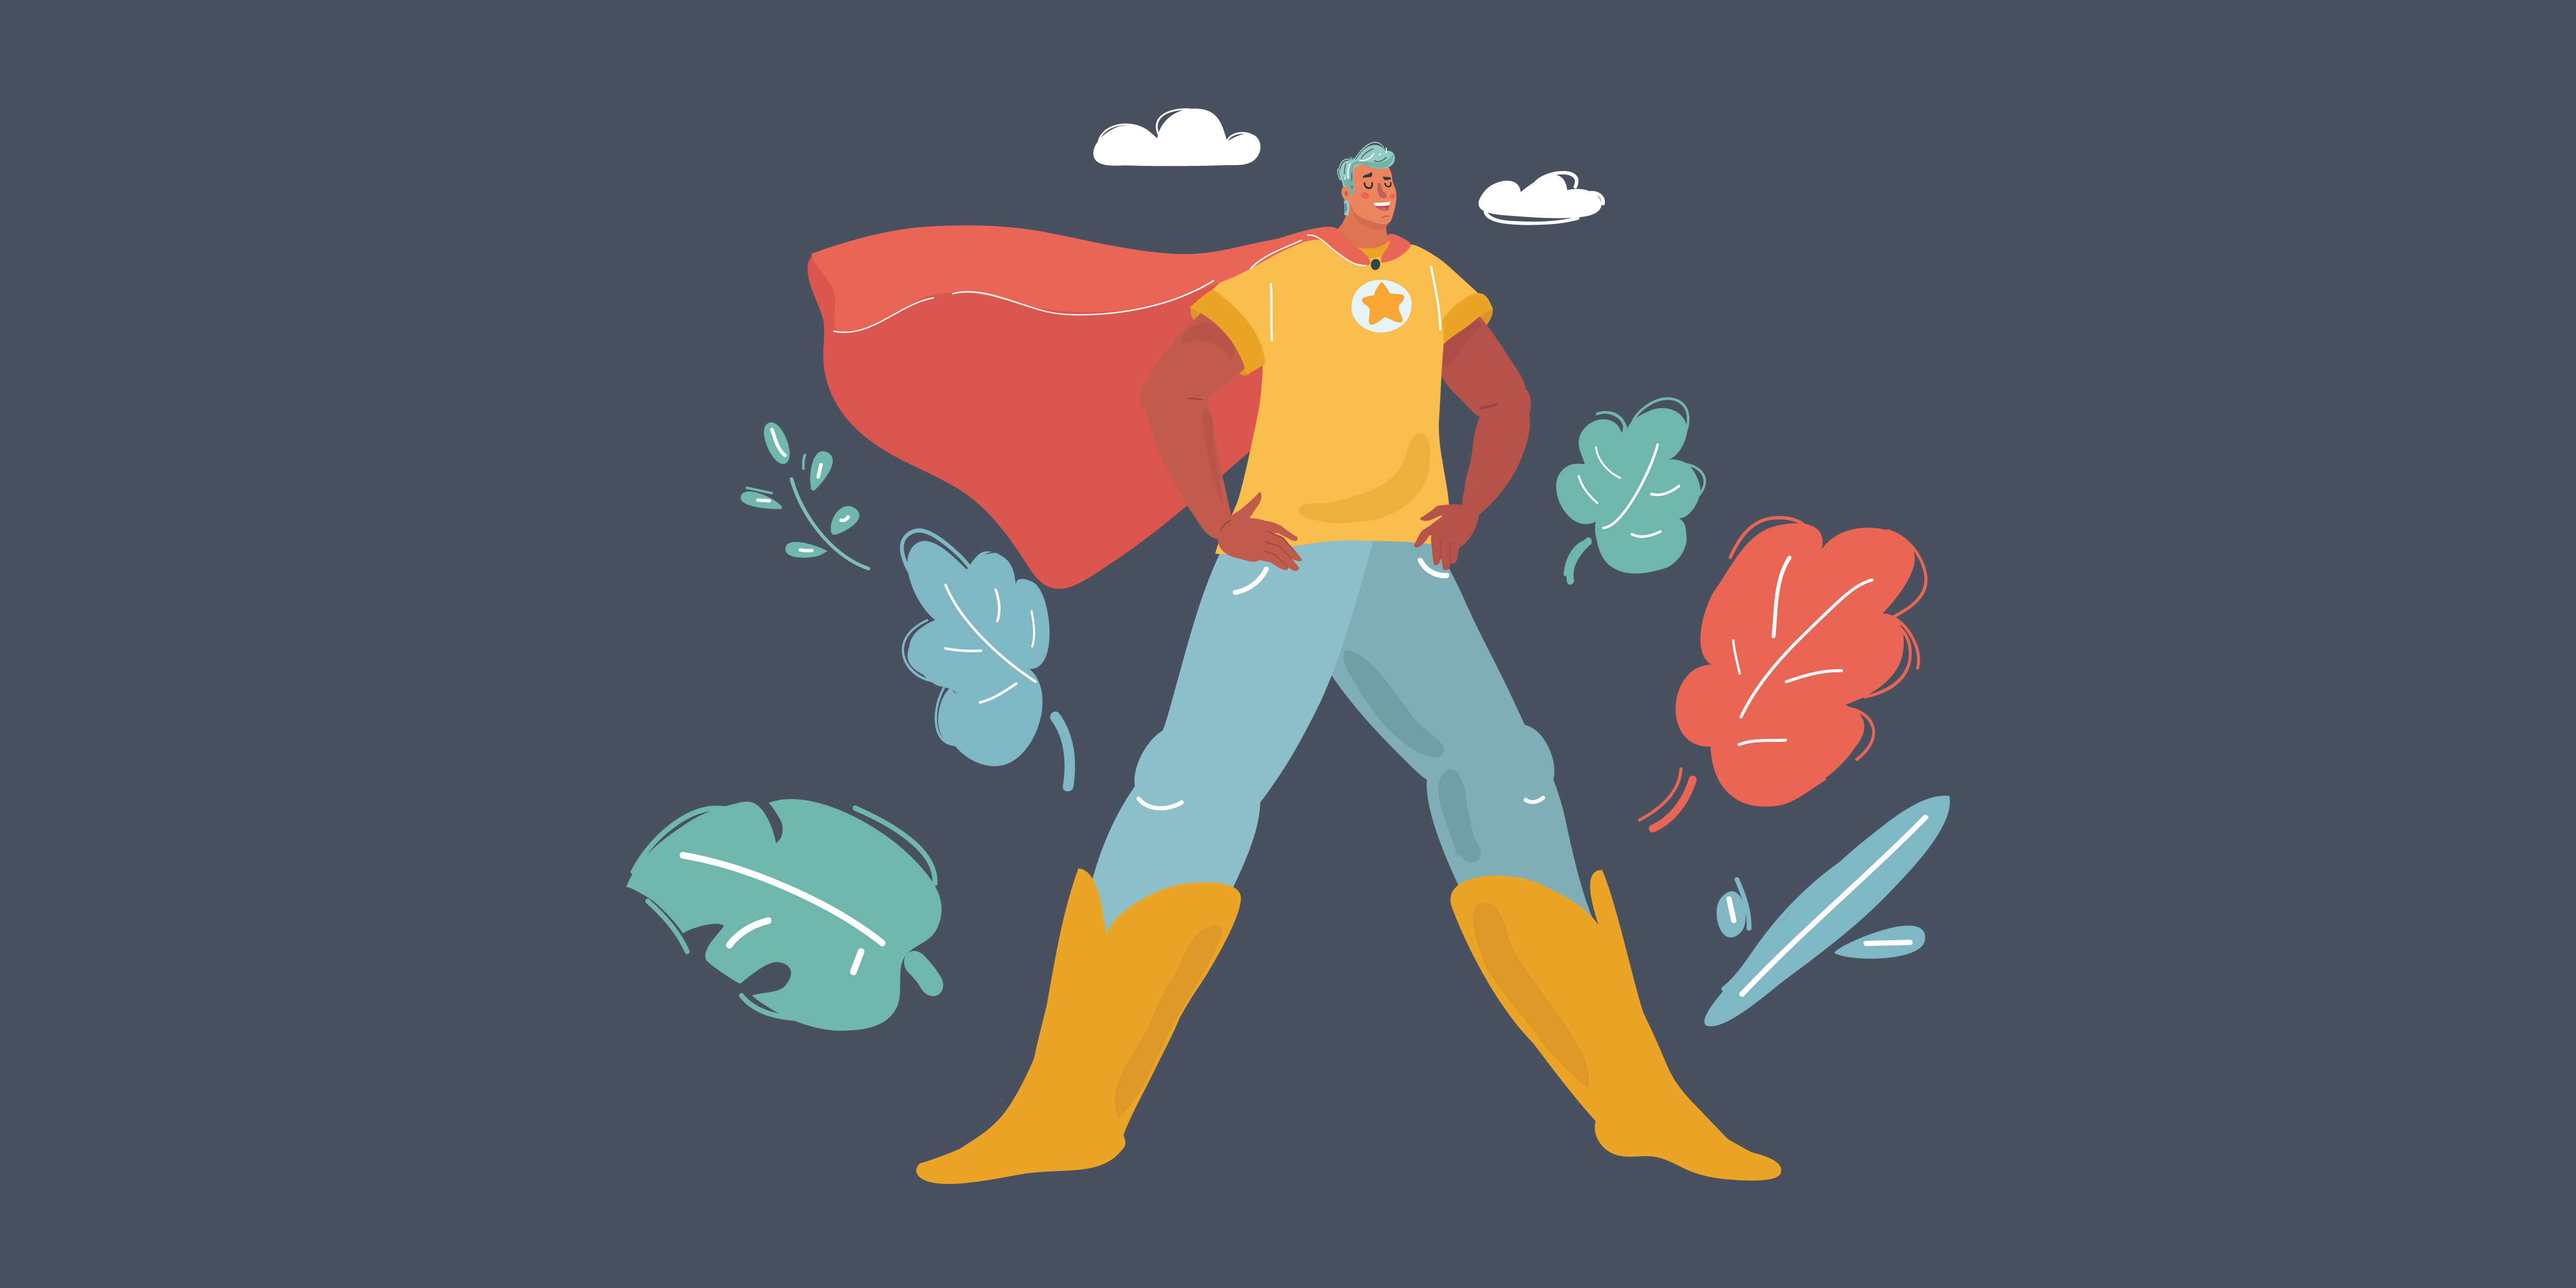 superhero-guy-01